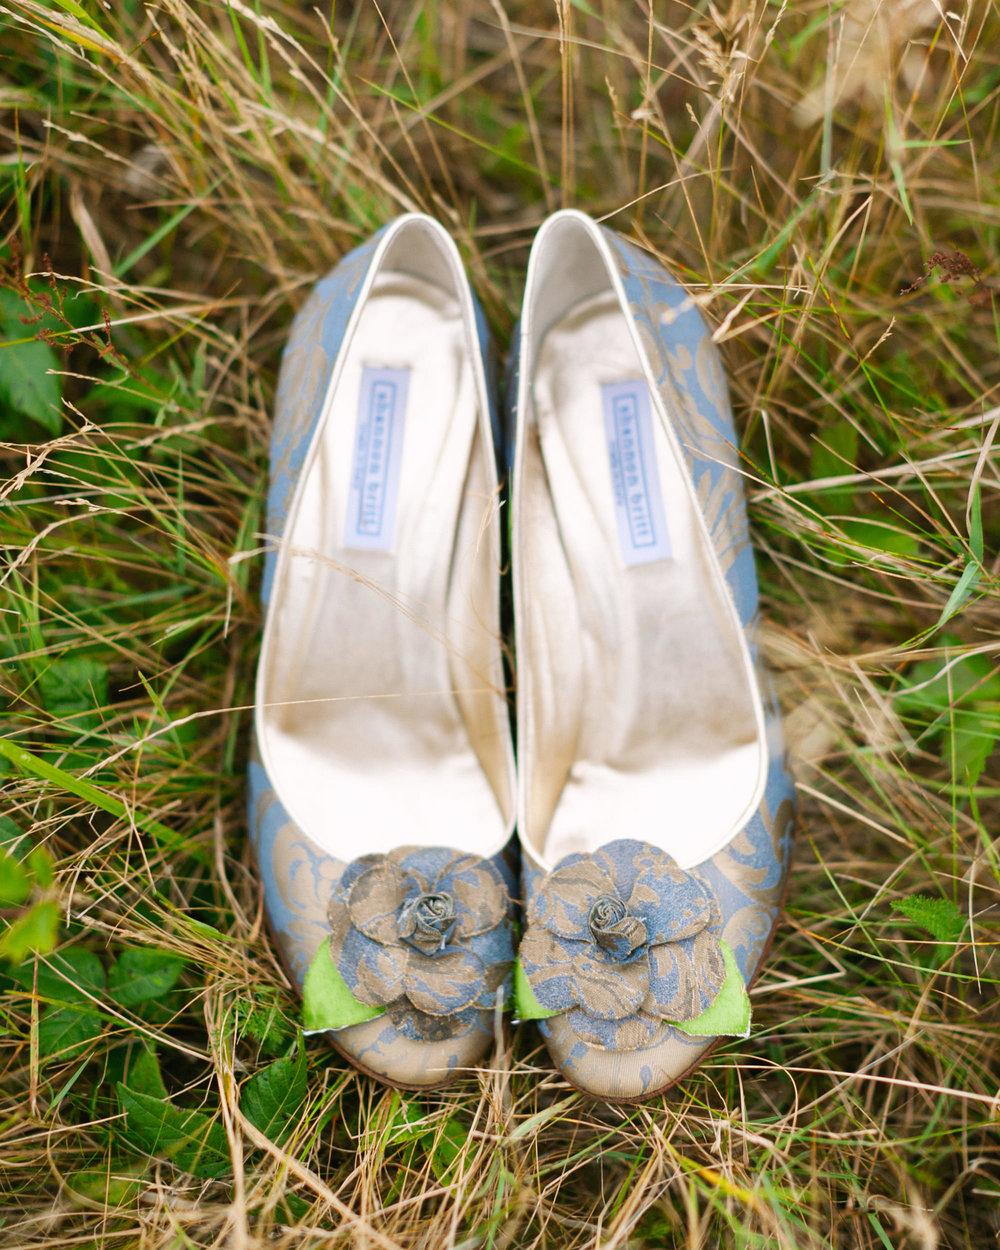 nantucket_siasconset_union_chapel_wedding_photos_06.jpg